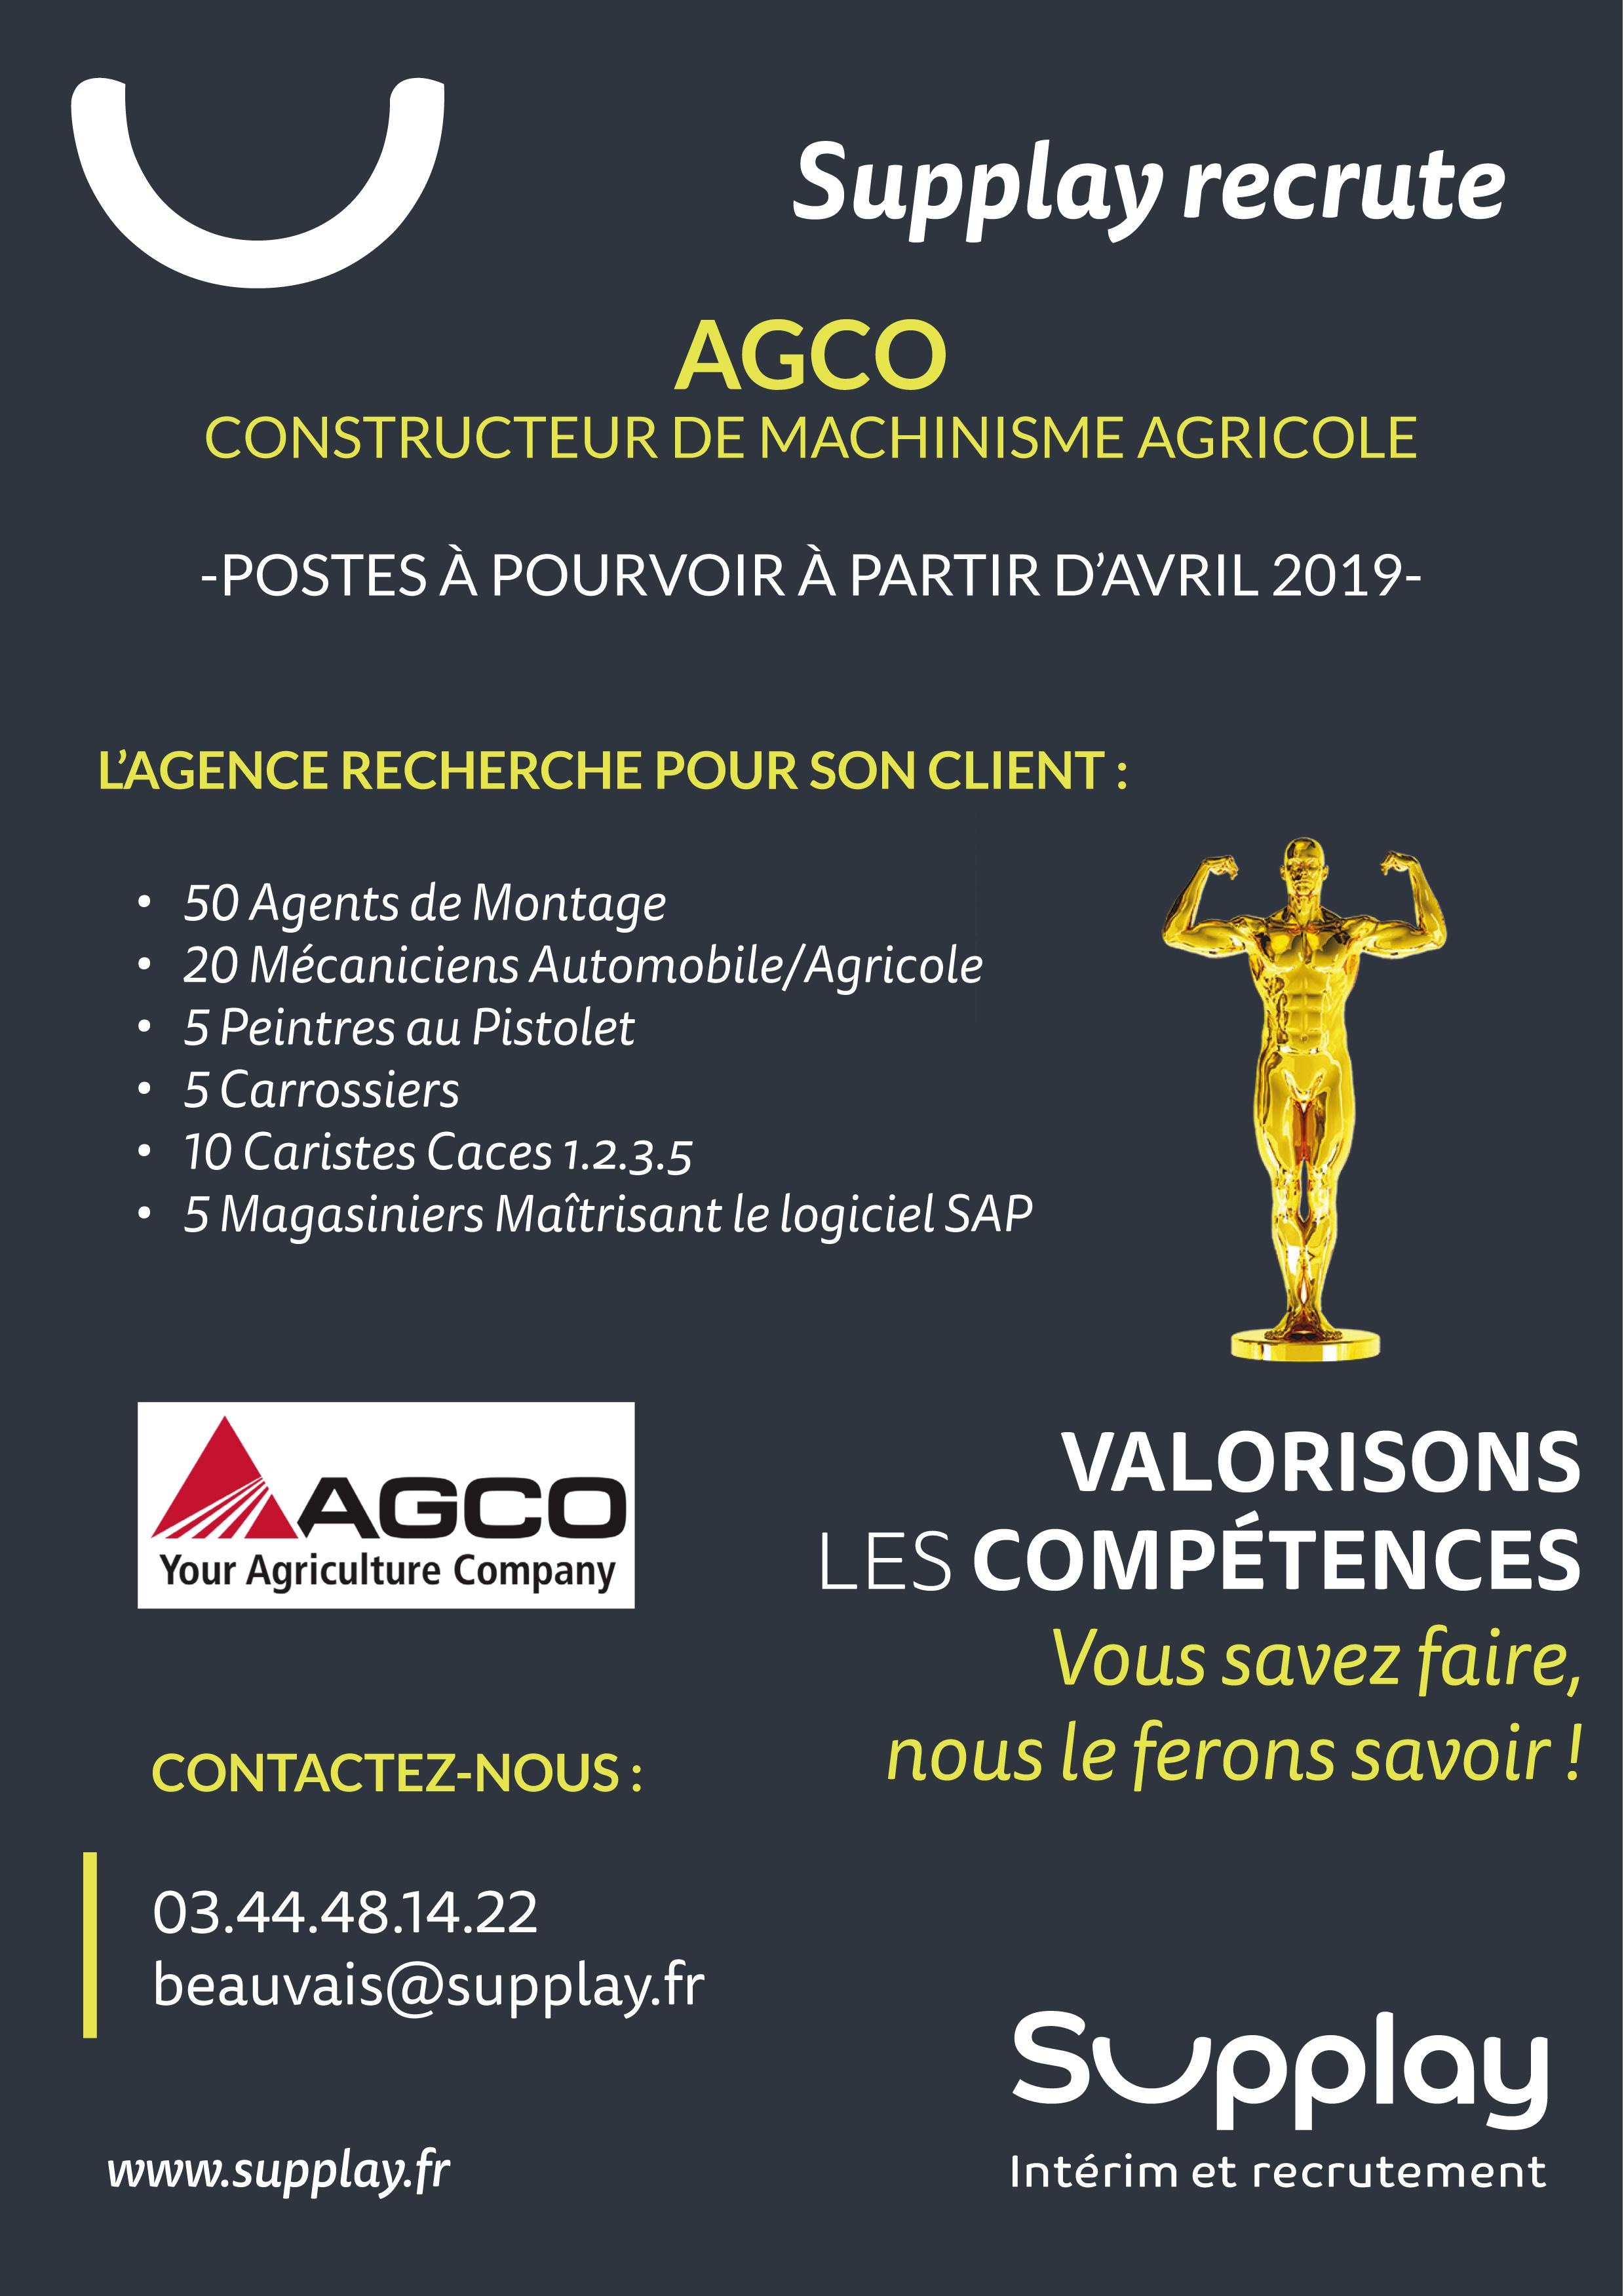 Supplay recrute pour AGCO !